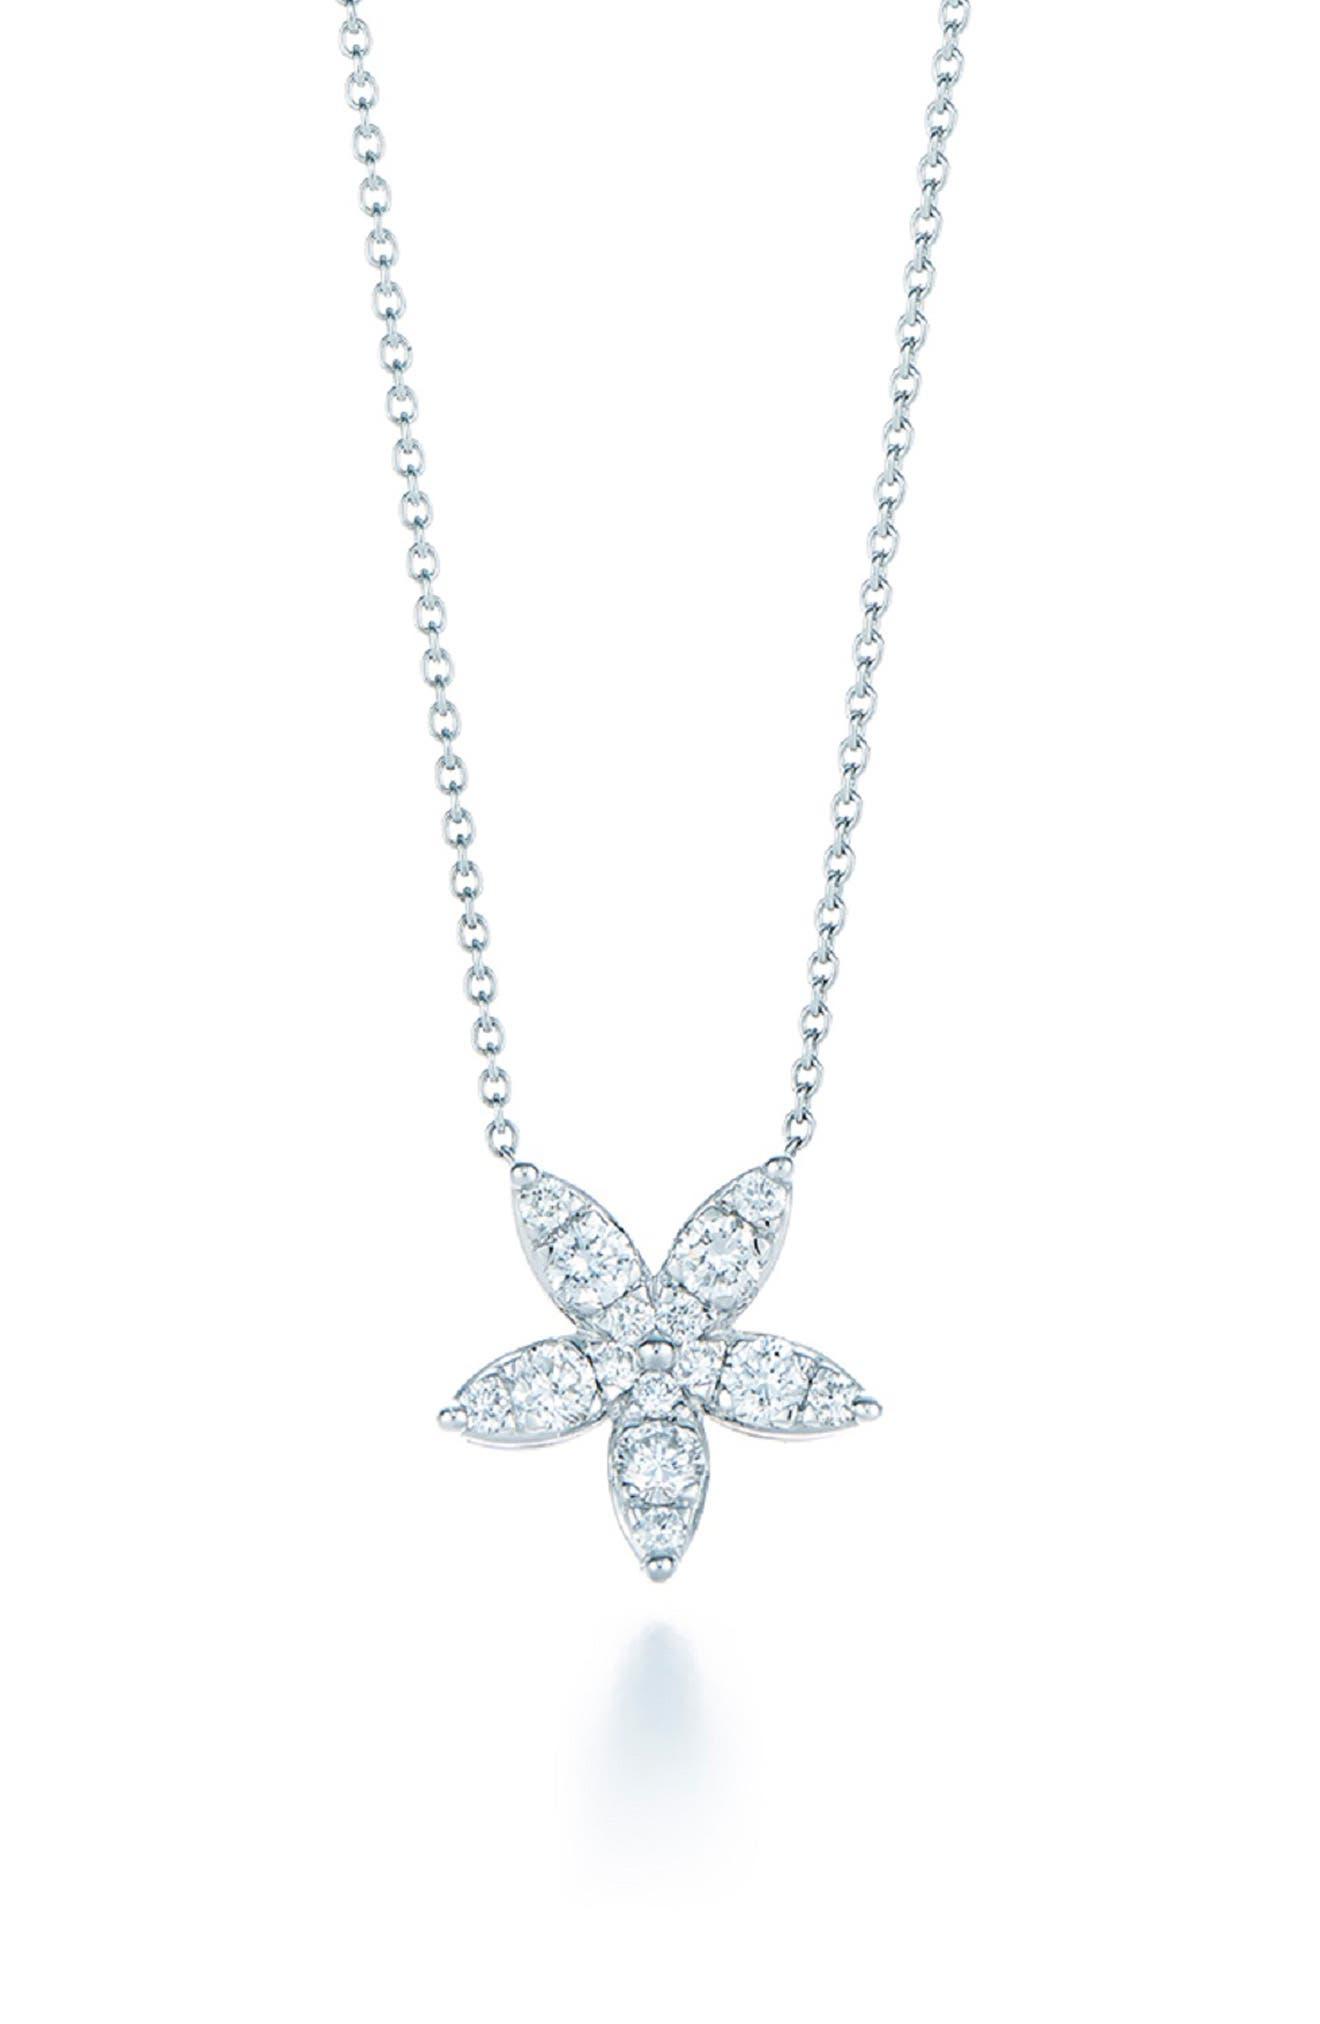 KWIAT Sunburst Flower Diamond Pendant Necklace in White Gold